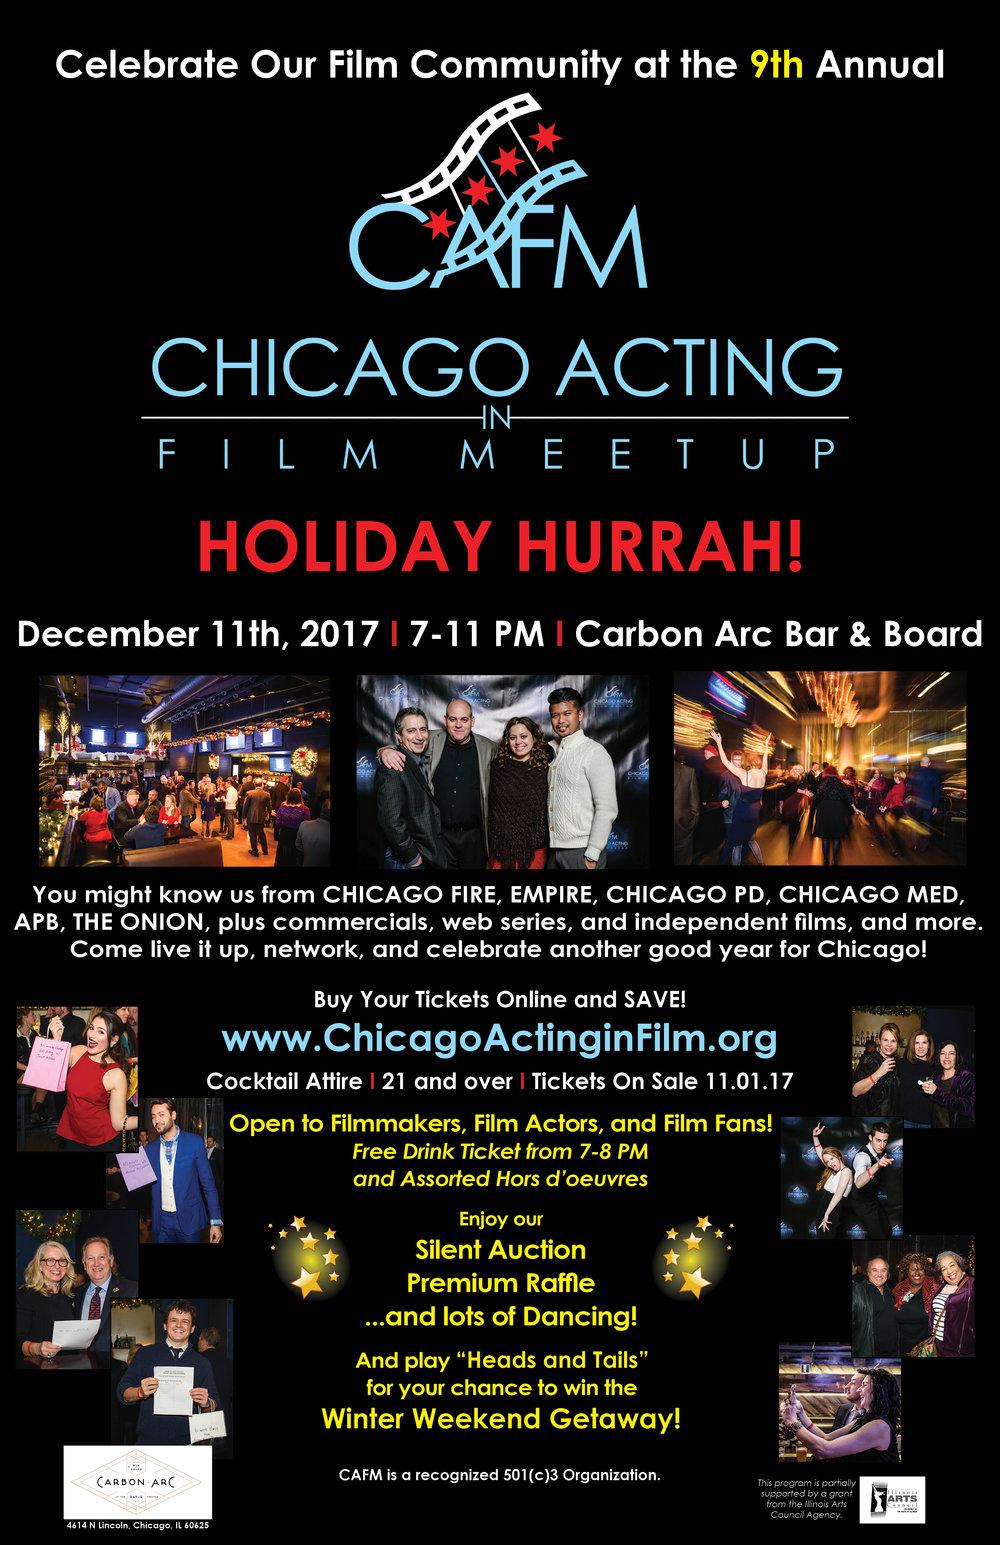 2017 CAFM Holiday Hurrah Poster